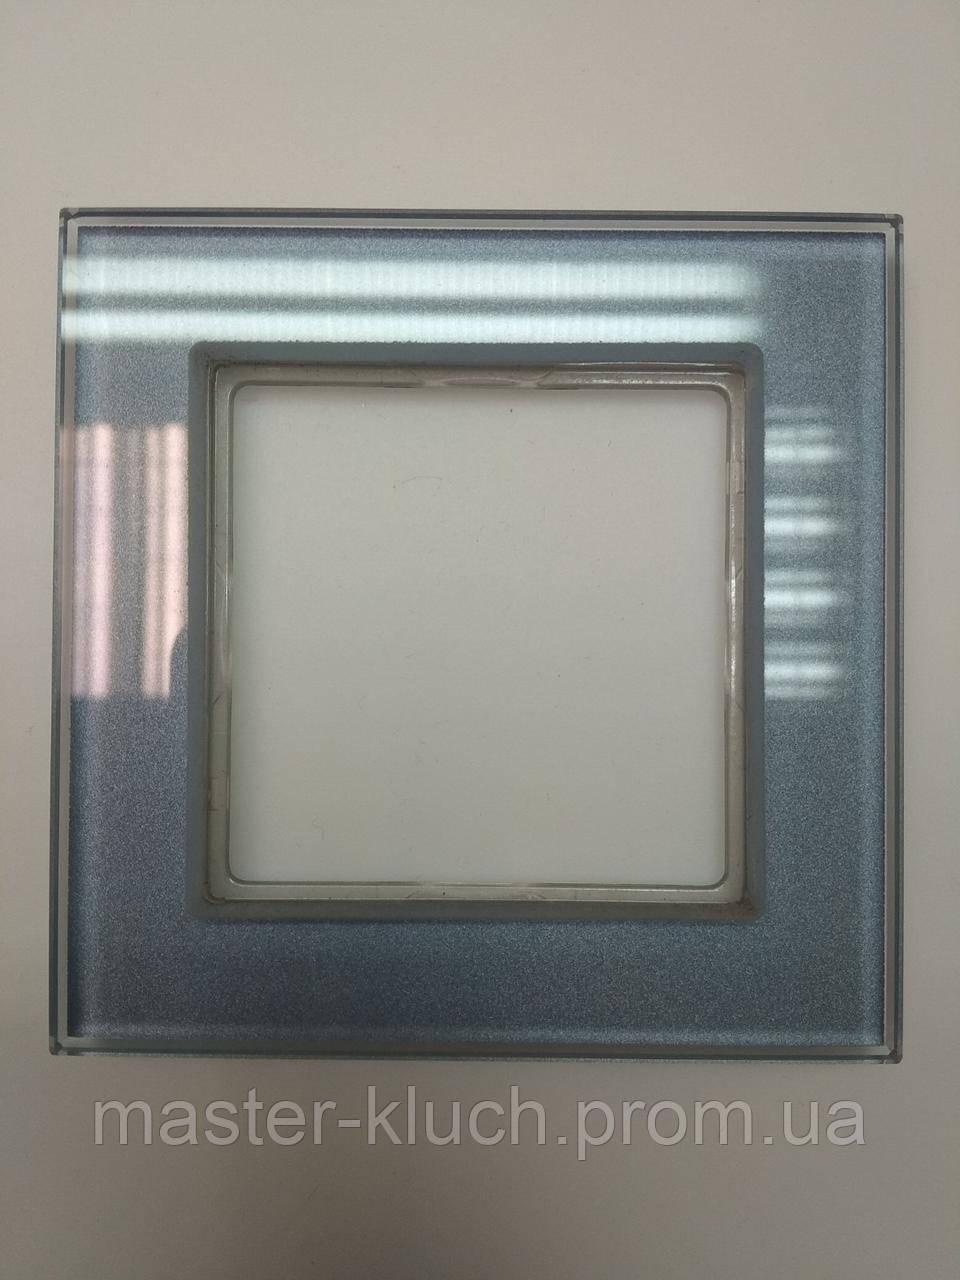 Рамка одинарная Jung A-creation стекло